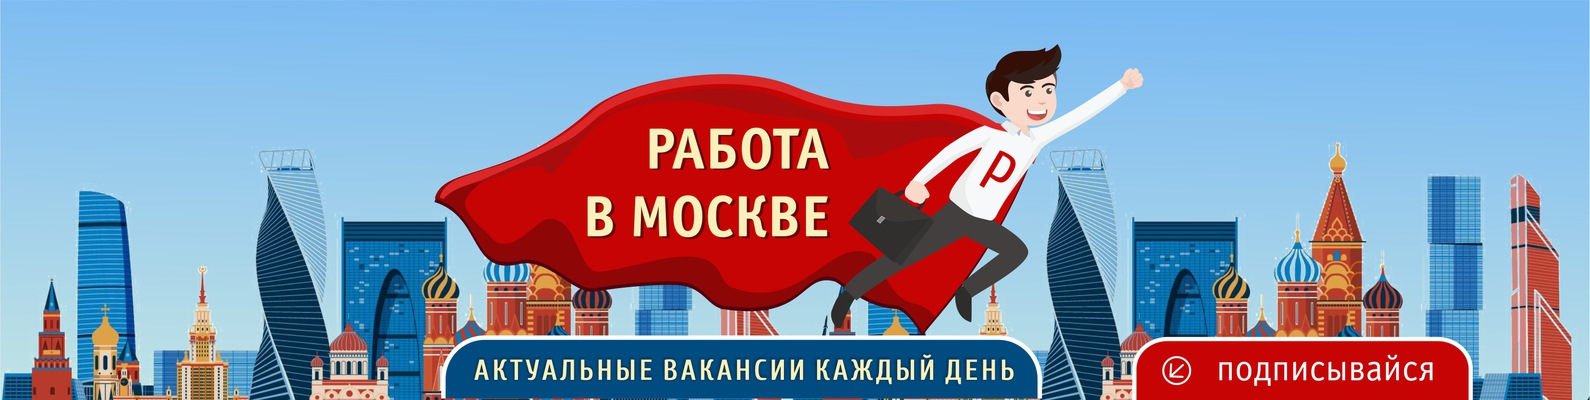 93271bfe3e6 Работа в Москве